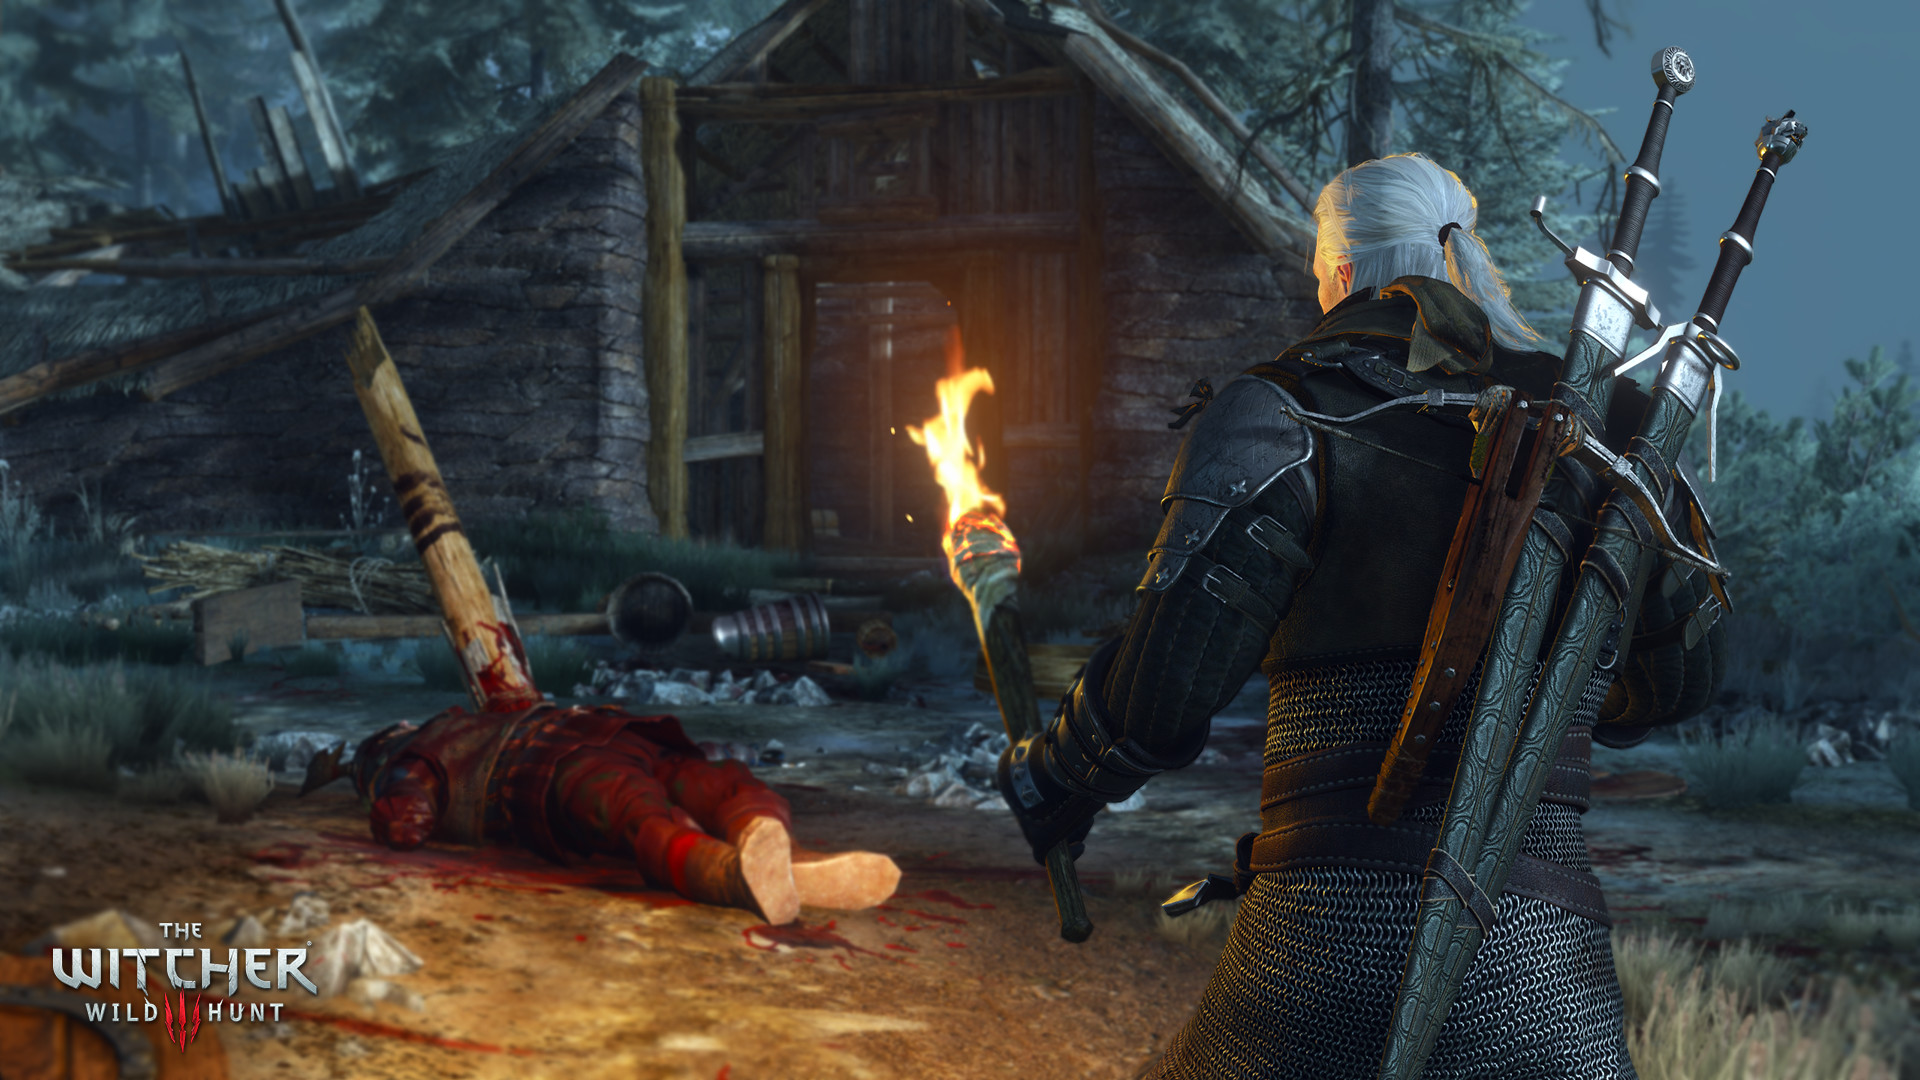 Купить The Witcher 3: Wild Hunt + подарок + бонус [STEAM]